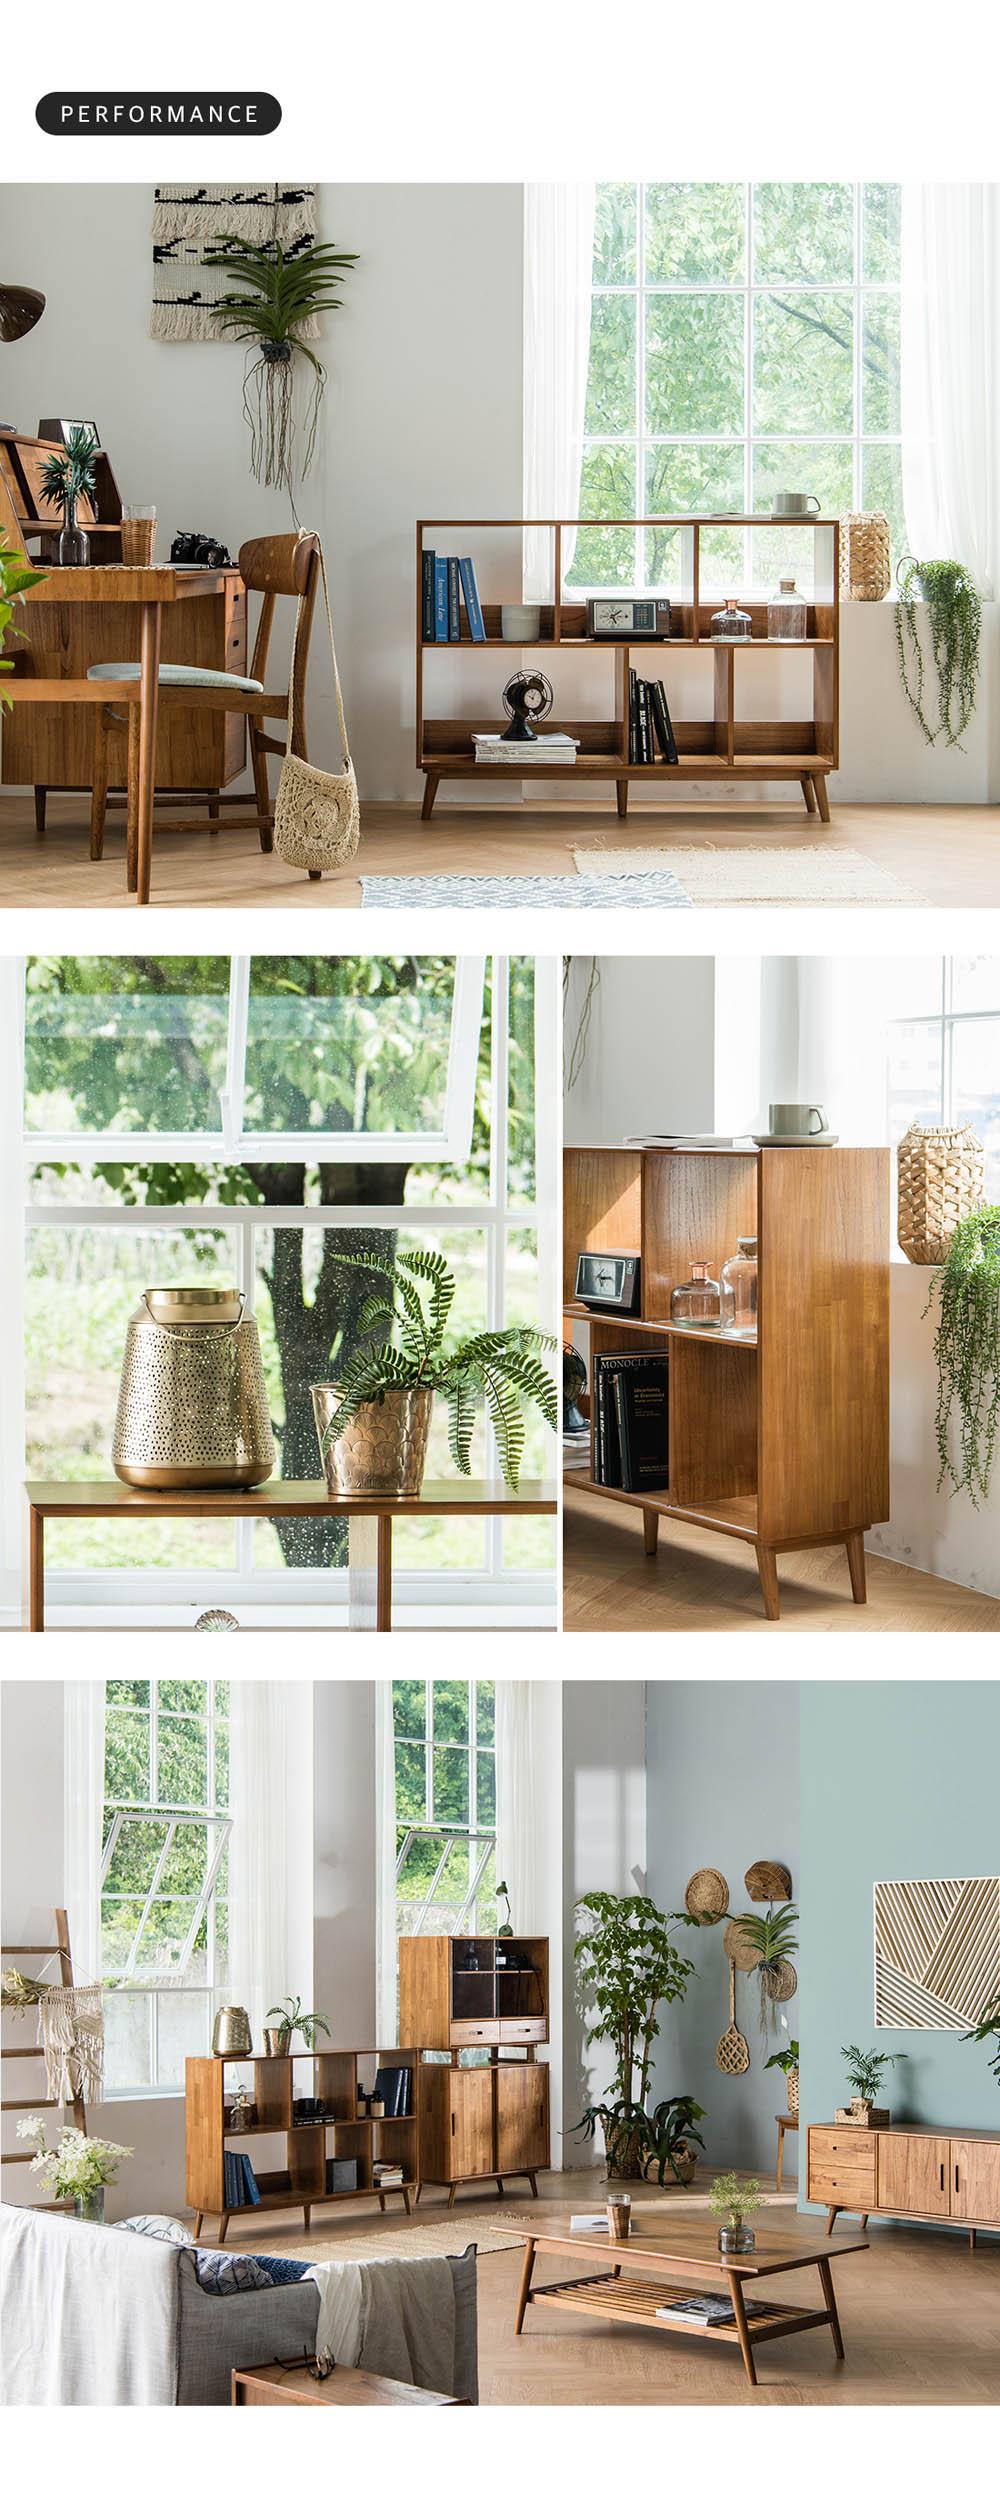 New_Retro_Square_Book_Shelf_Furniture_Online_Performance_1_Singapore_by_born_in_colour